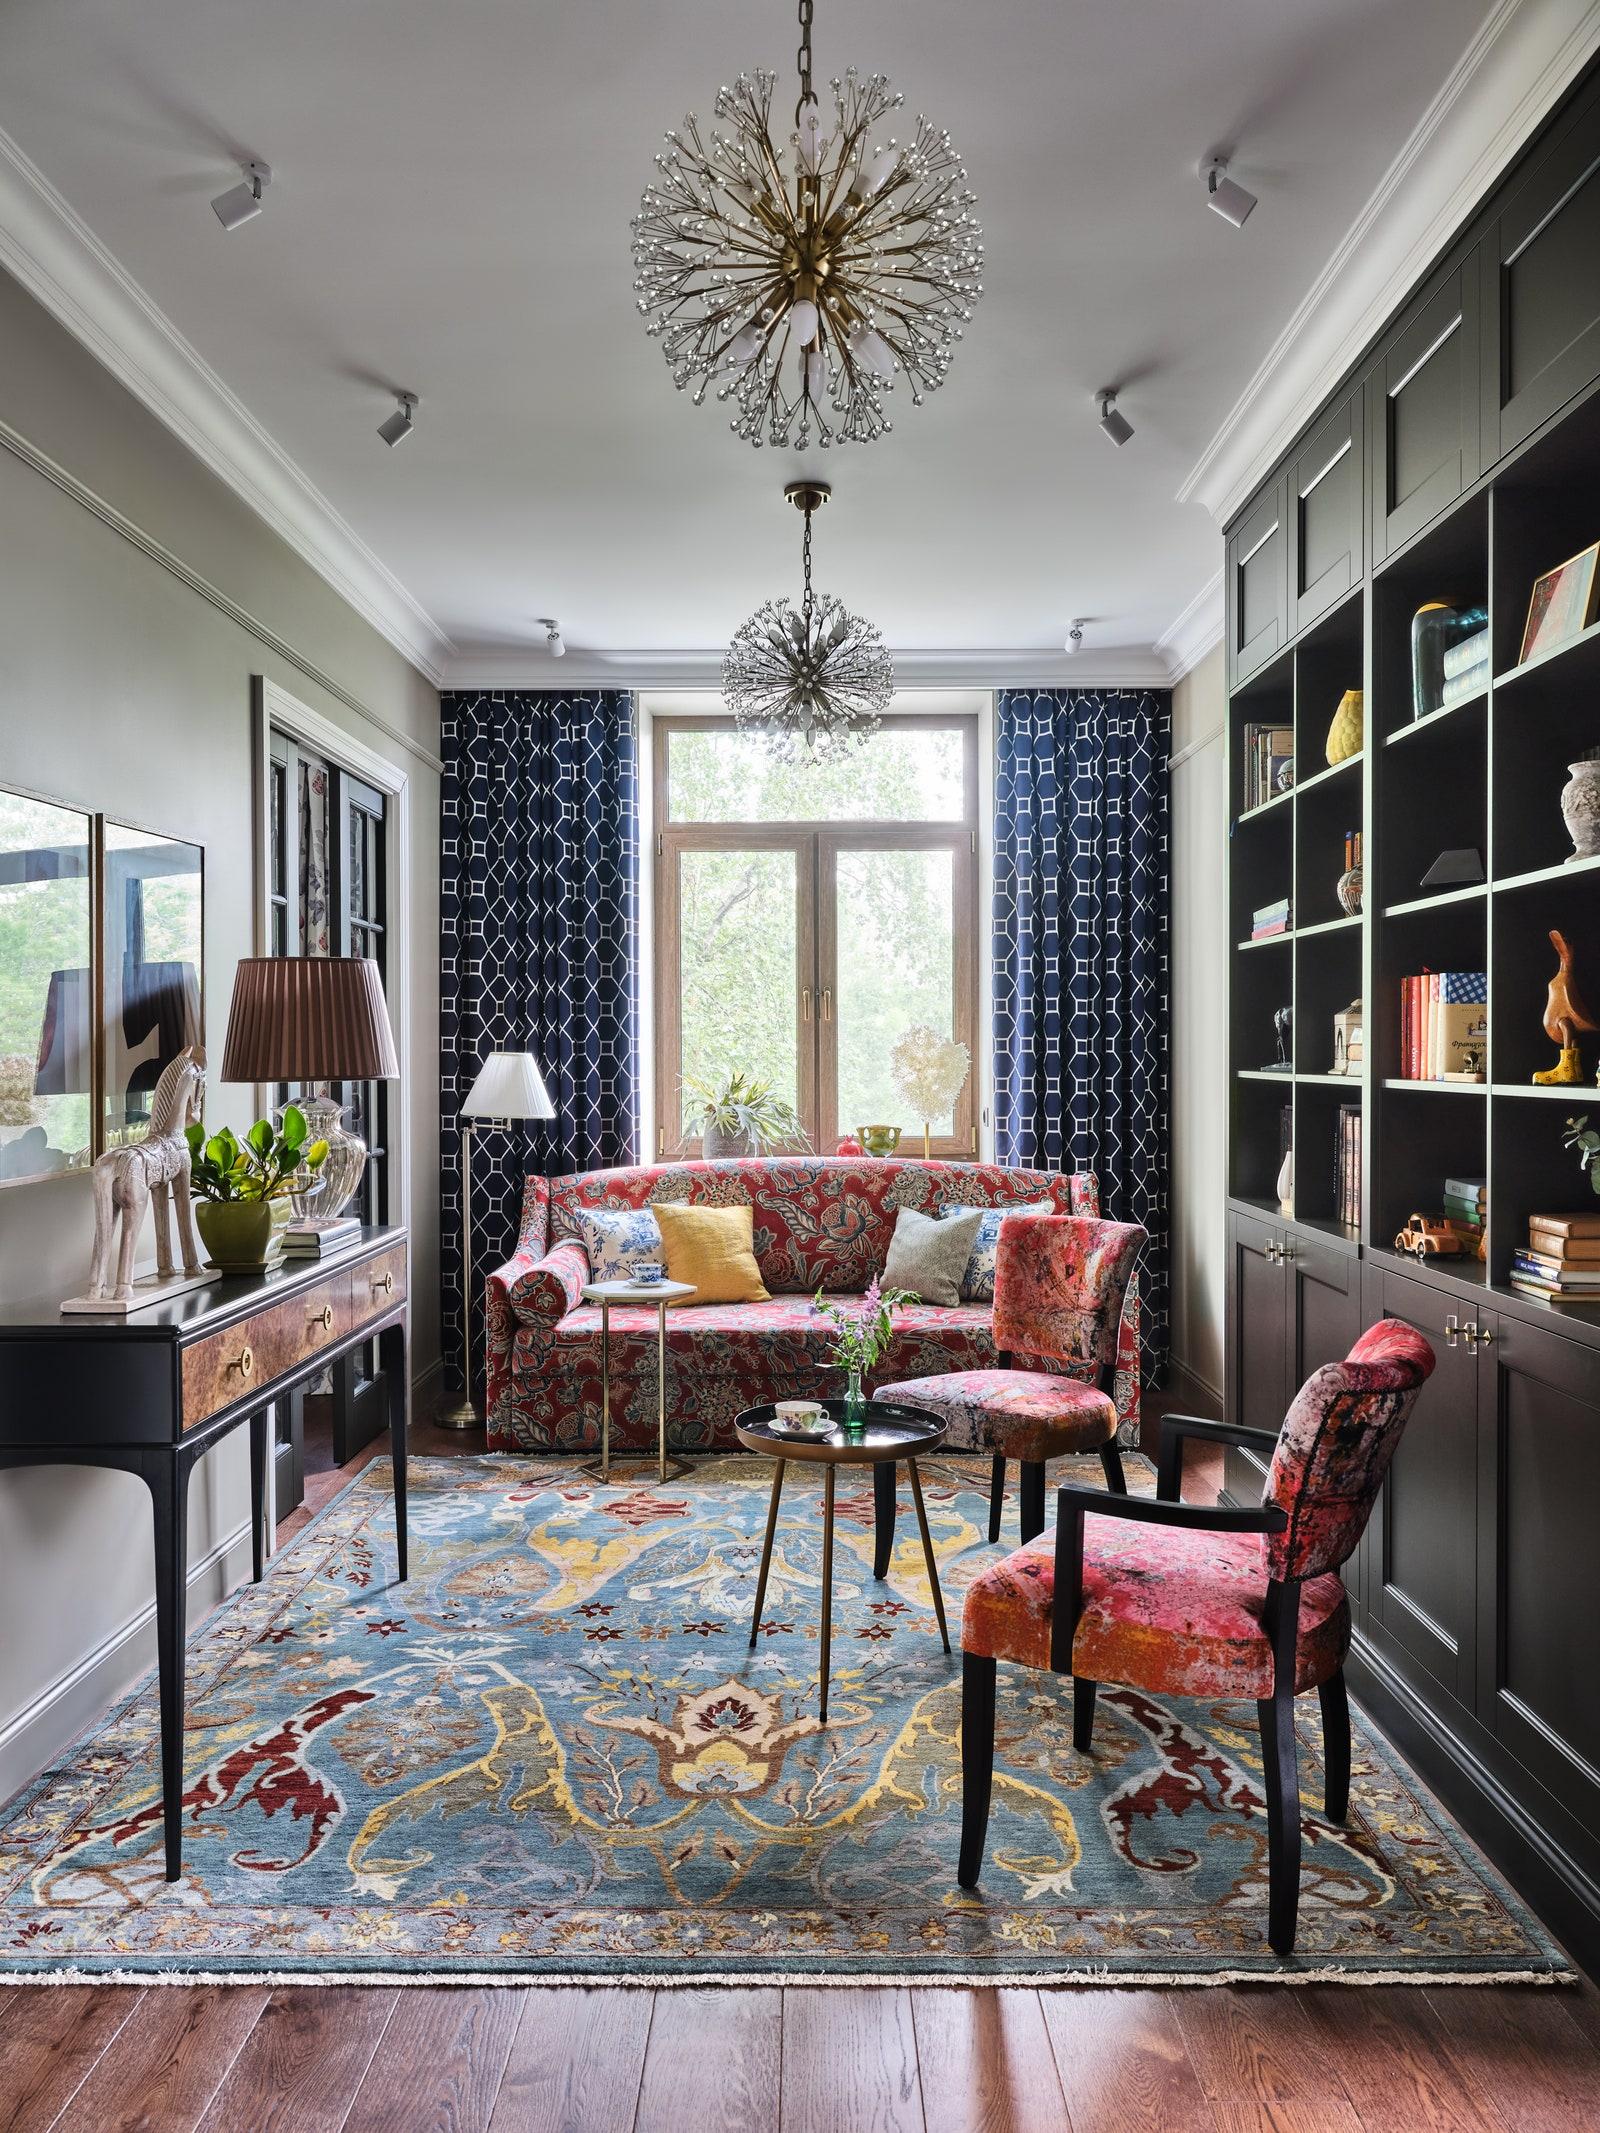 .  Dantone Home   Sanderson  Dovlet House    Home Concept   Unica Mblr     Dantone Home   Hudson Valley   Sanderson   ...